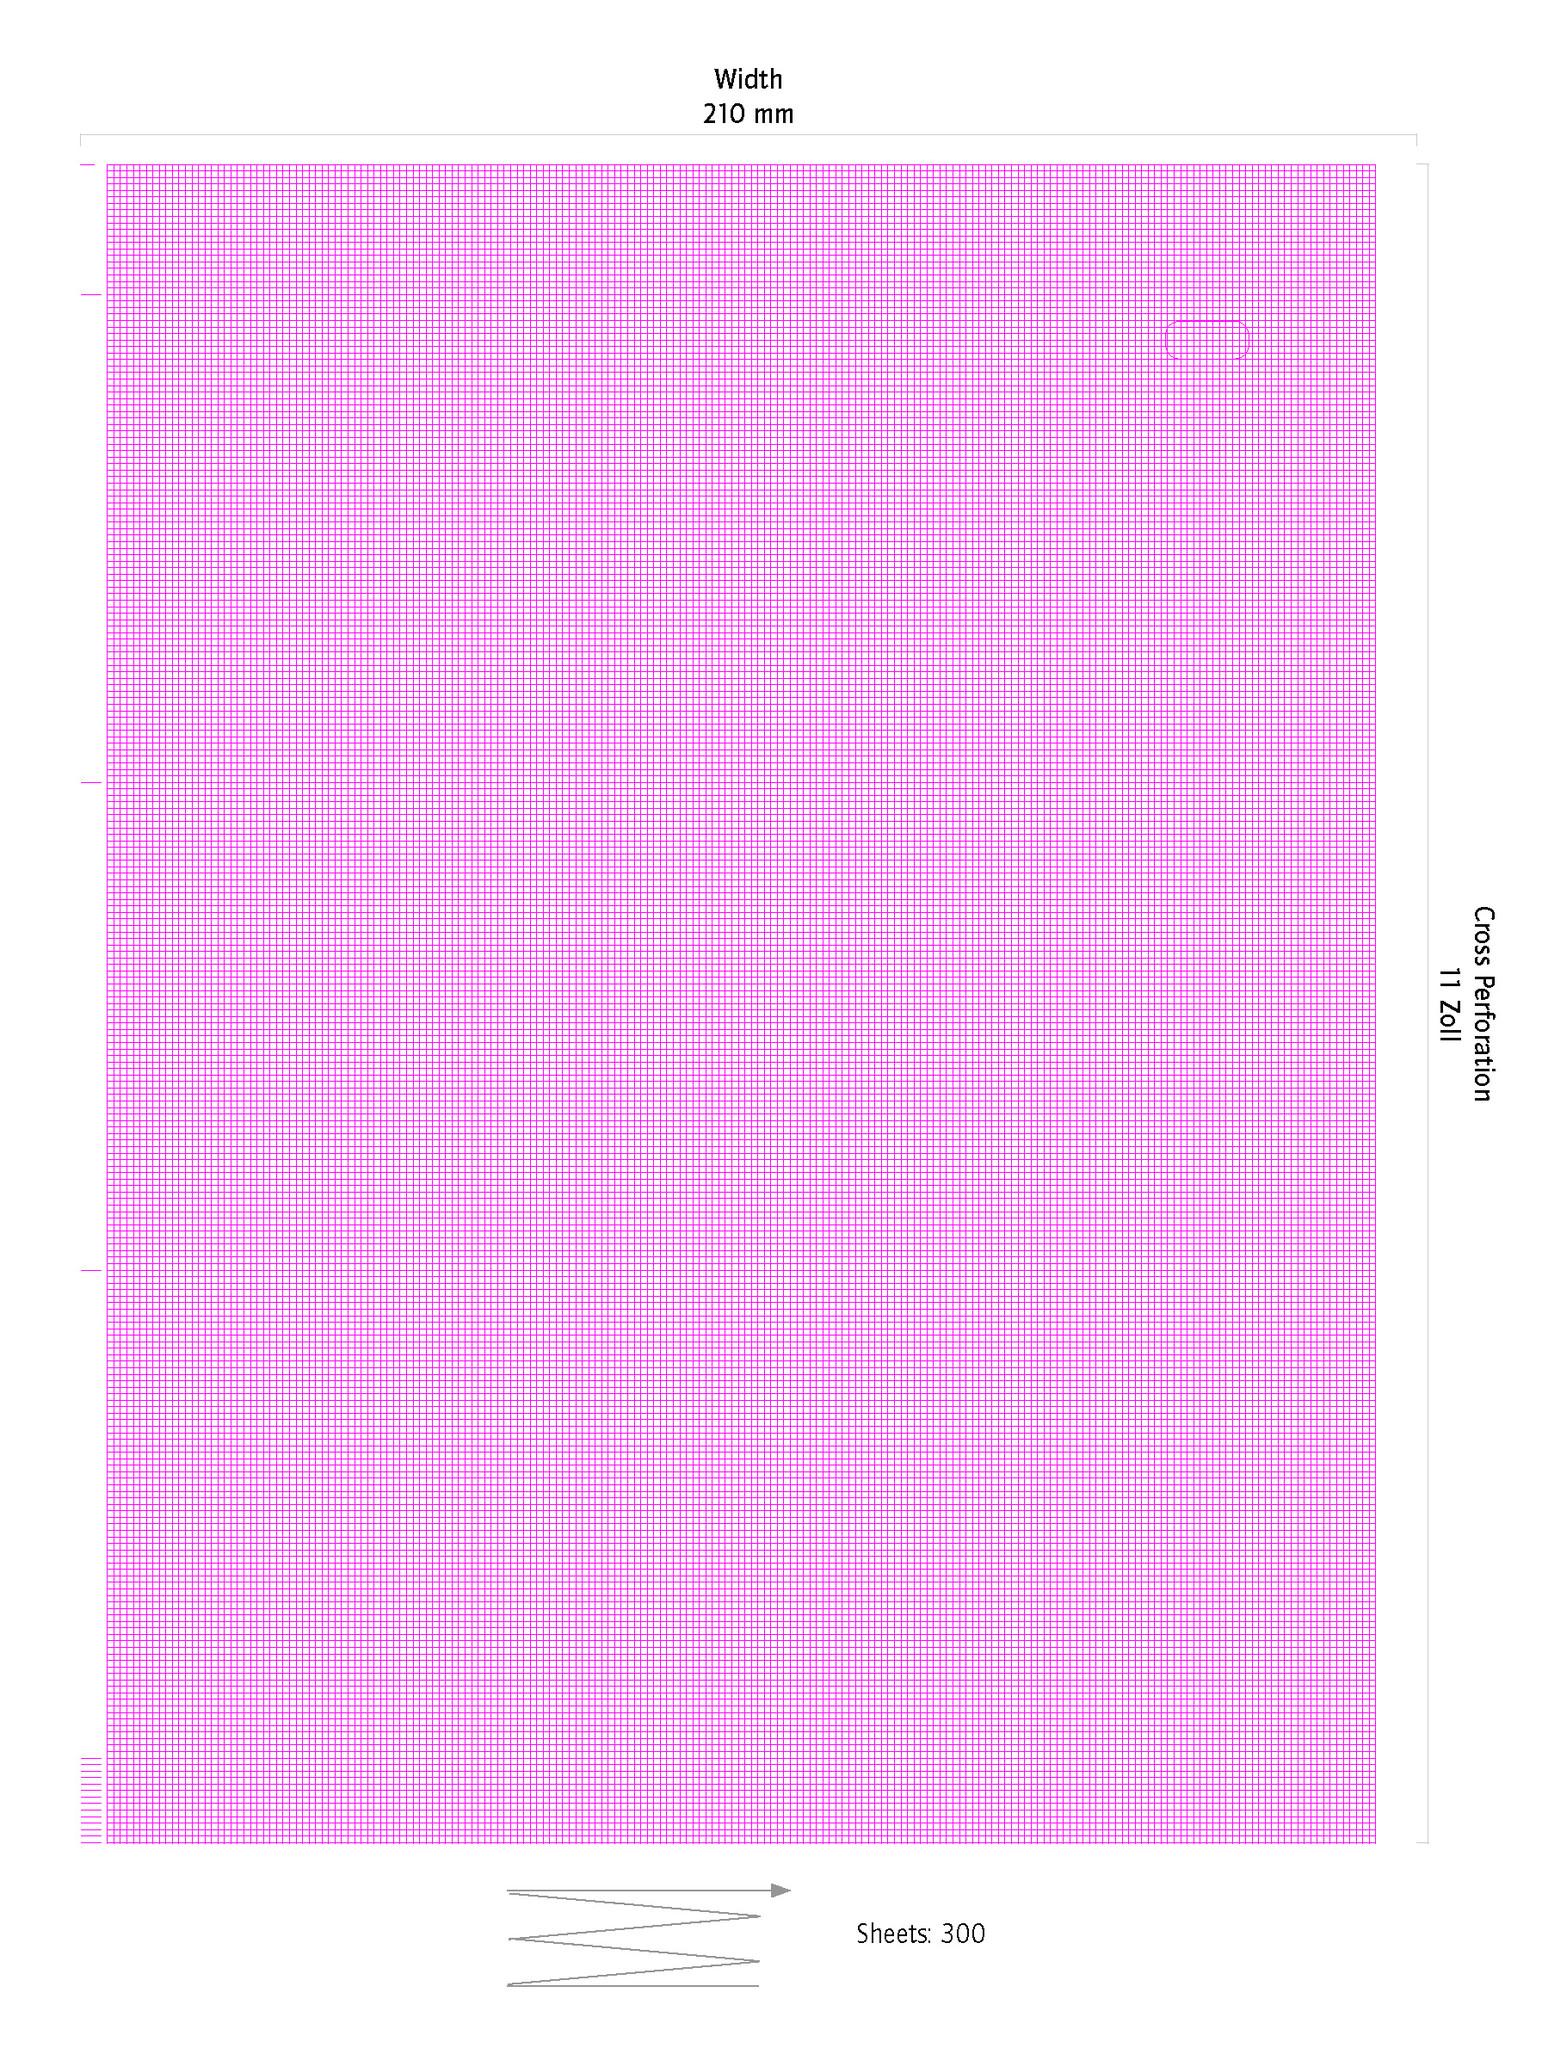 Medische Vakhandel ECG paper Carefusion (GE Marquette) Mac5500 210 mm x 280 mm x 300 bl, 3 pieces